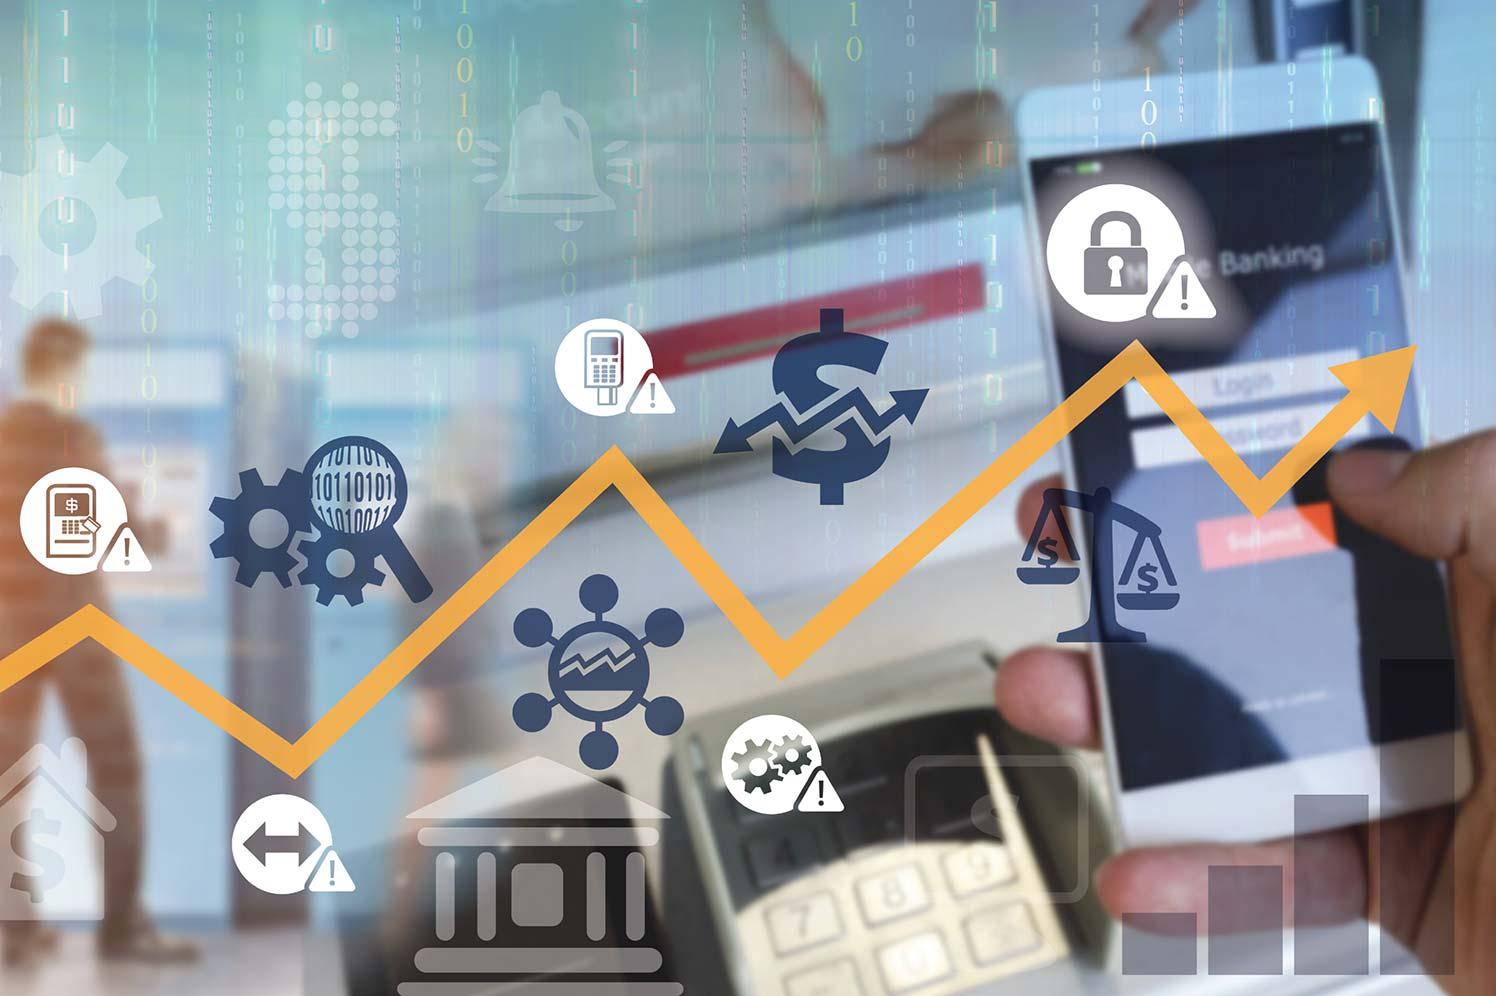 banking-on-atm-big-data-whitepaper